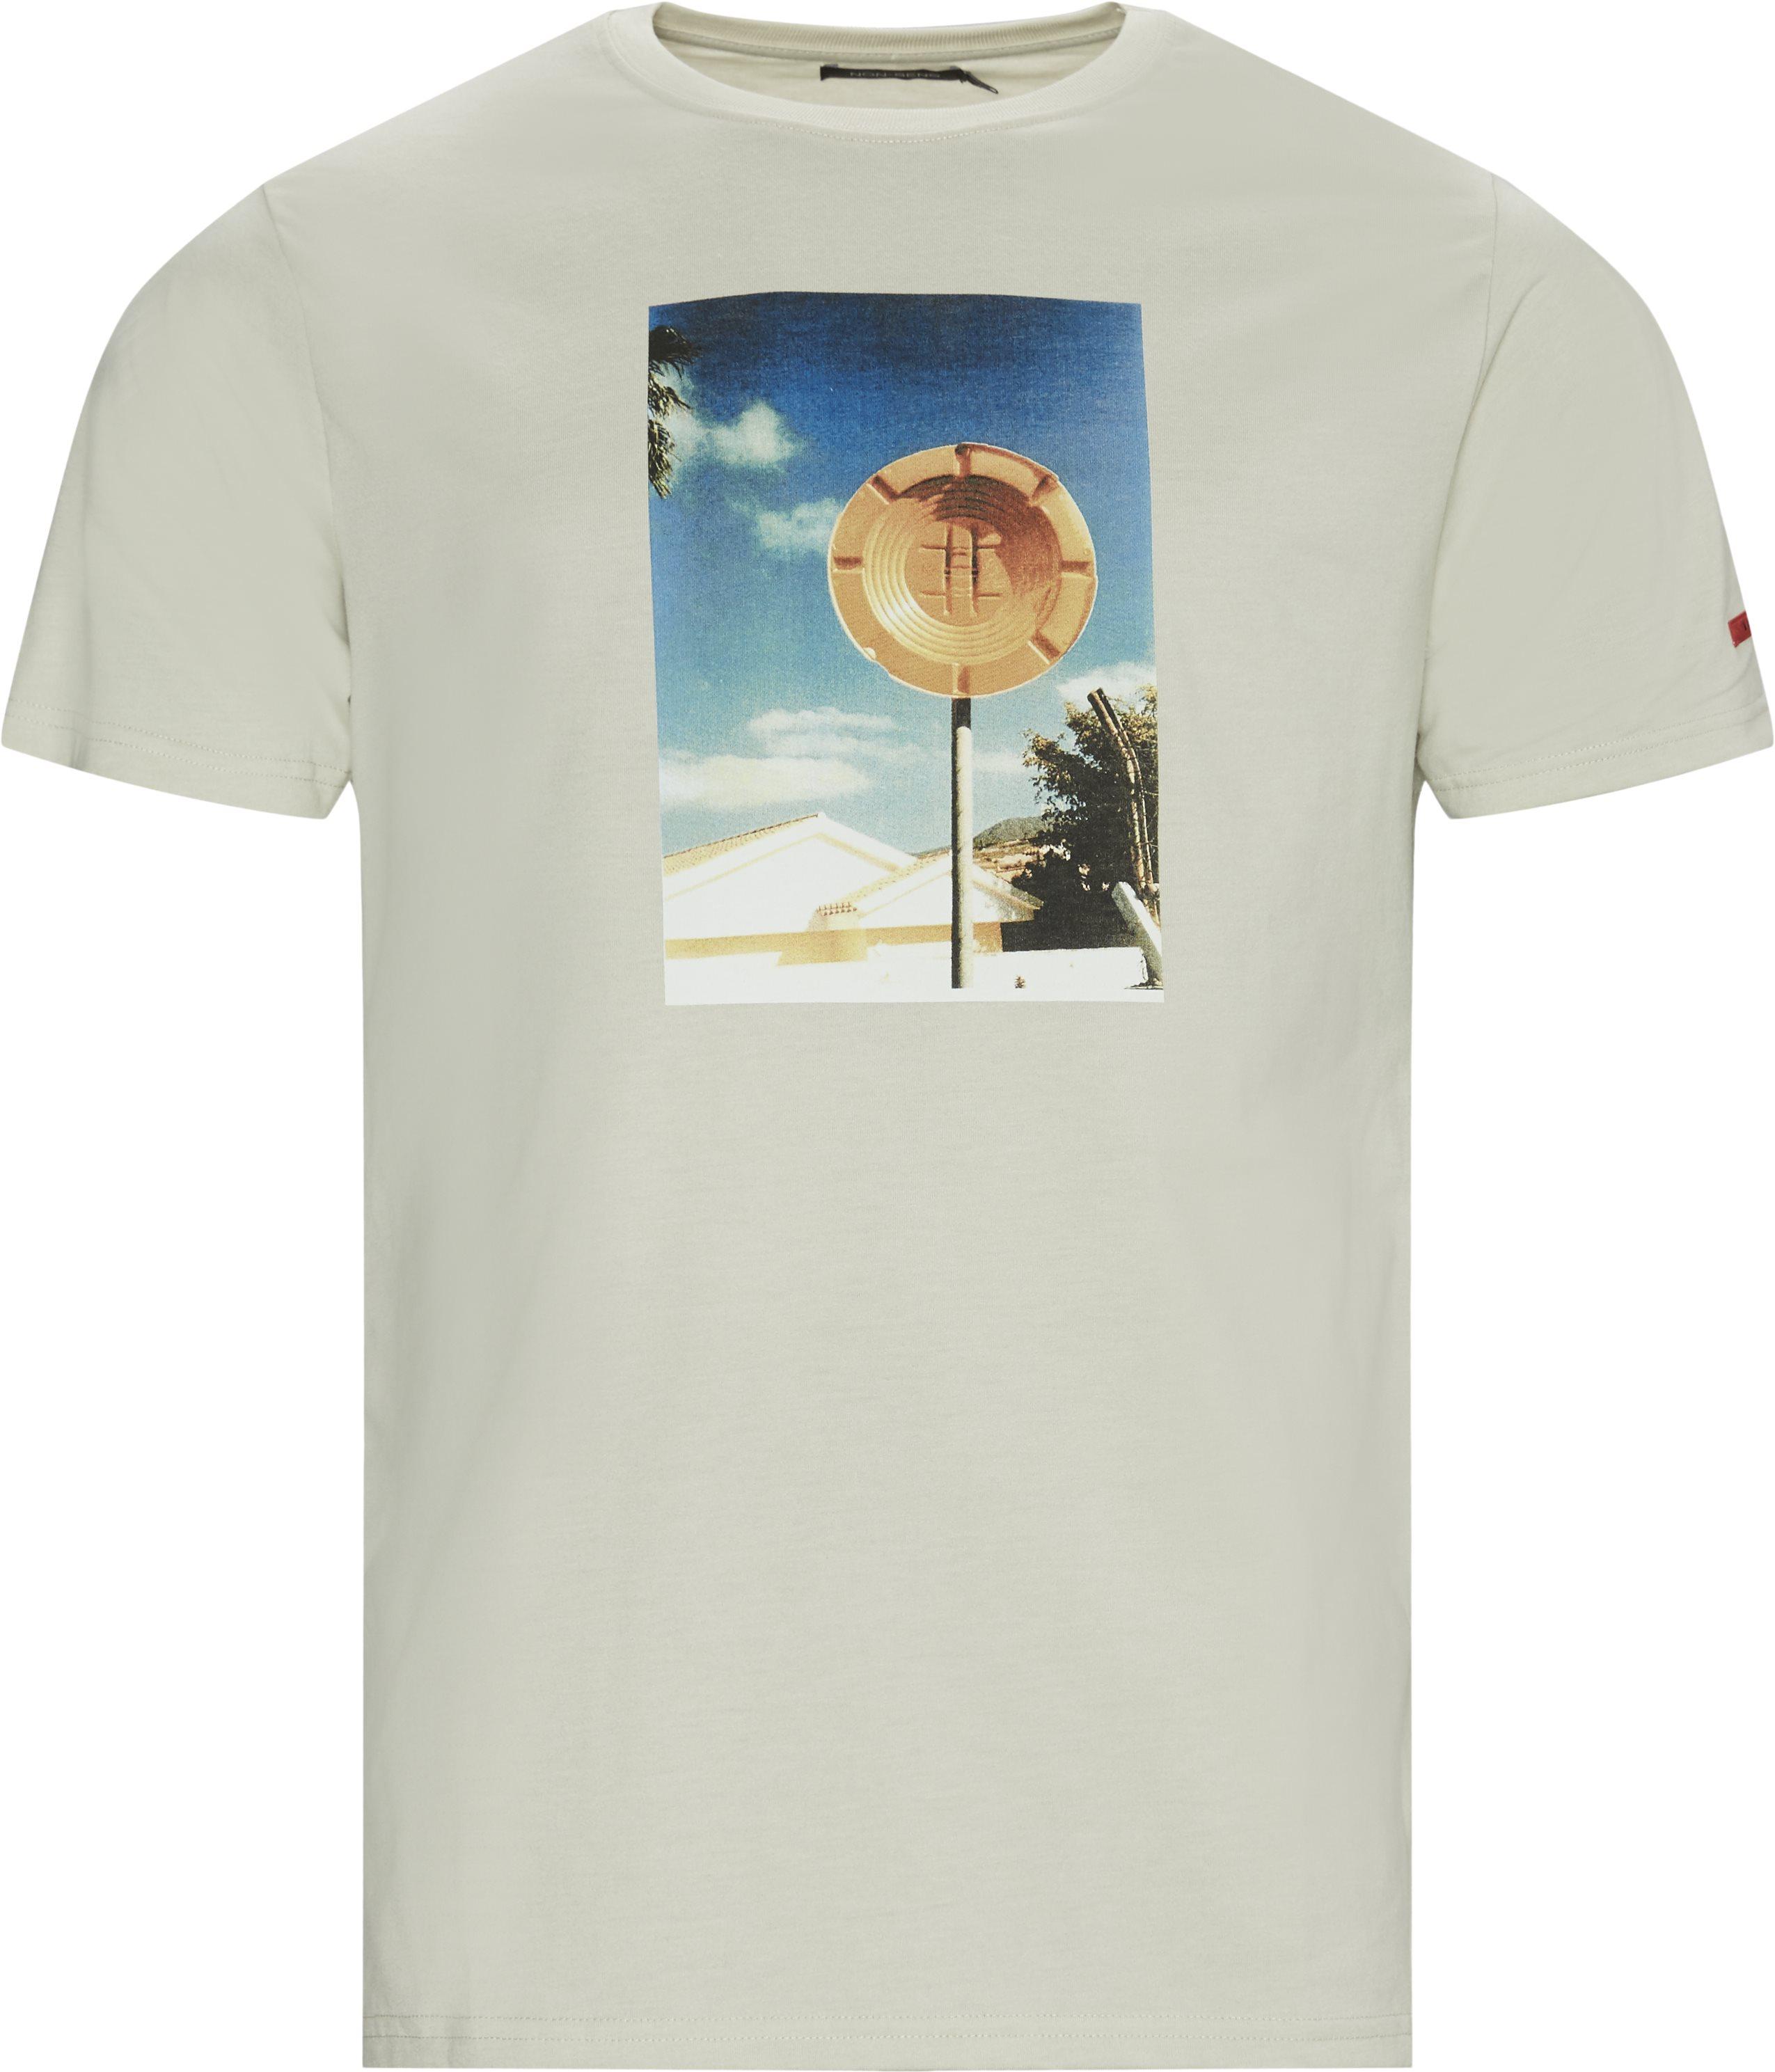 Parking Tee - T-shirts - Regular fit - Sand